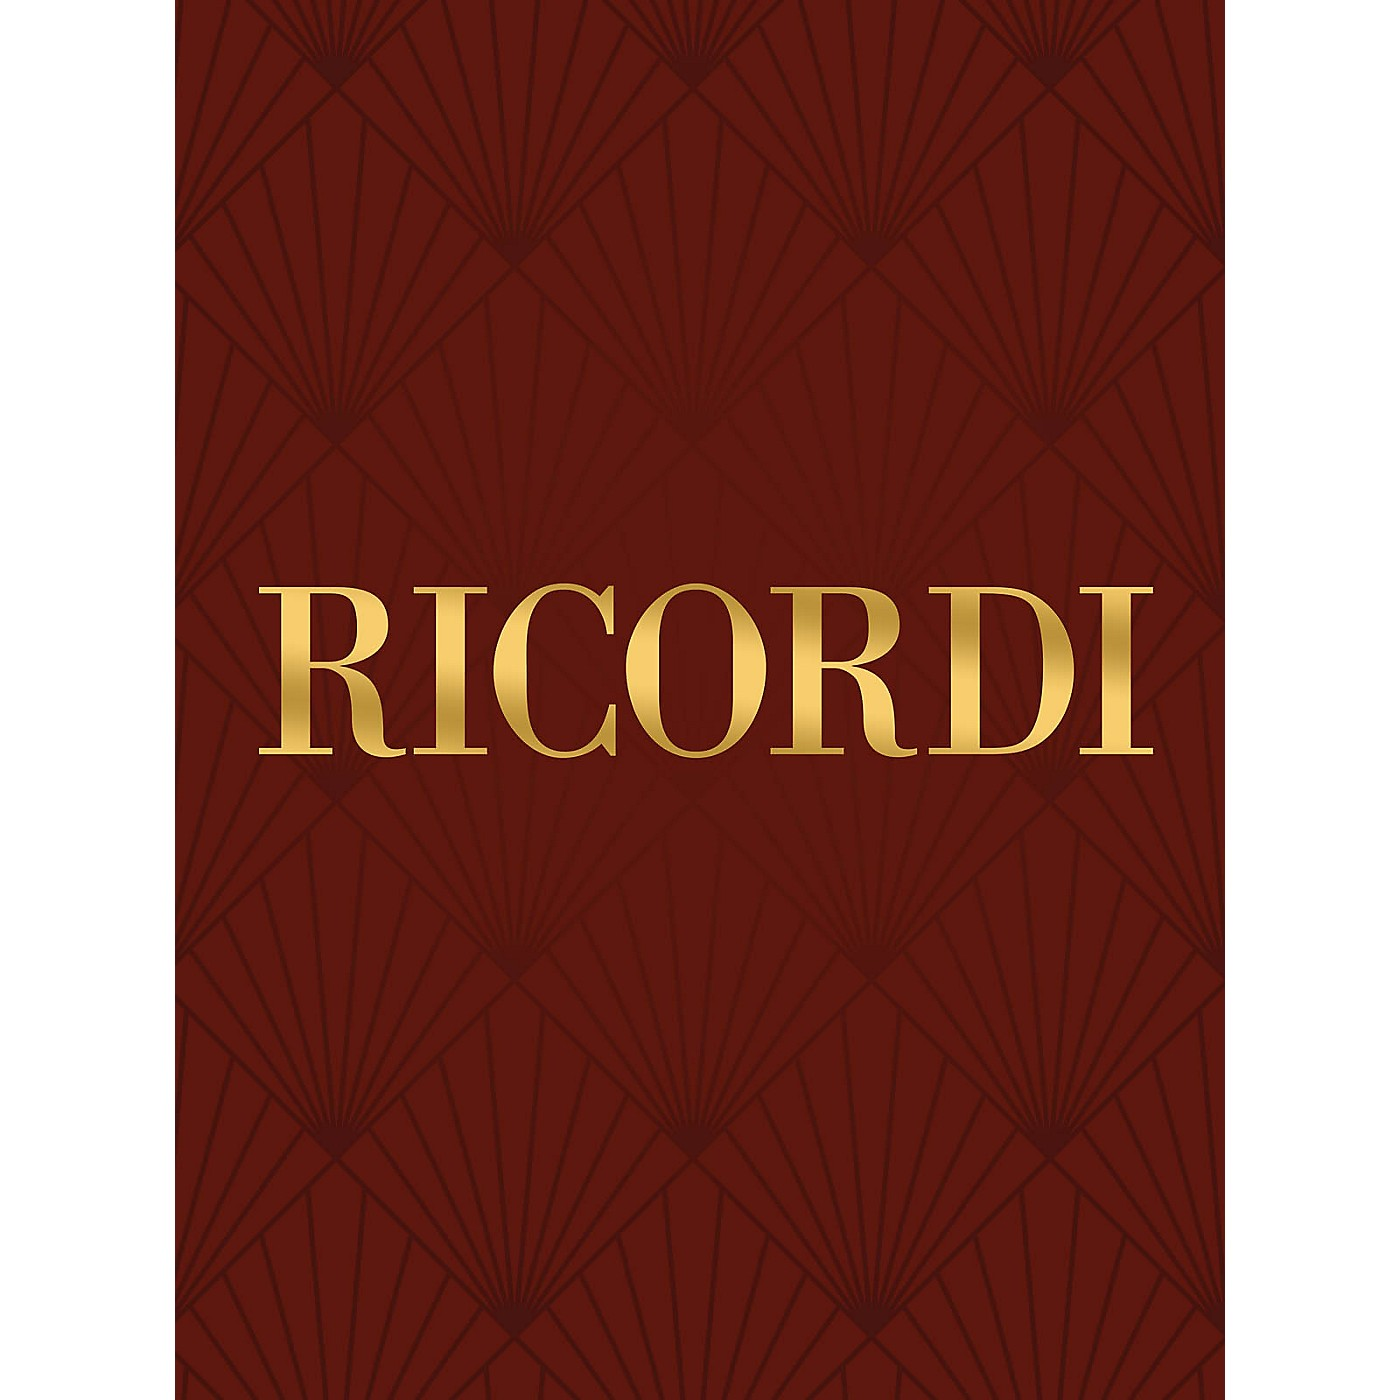 Ricordi Stabat Mater Op. 61 Lt/En (Vocal Score) Composed by Luigi Boccherini Edited by Allorto thumbnail